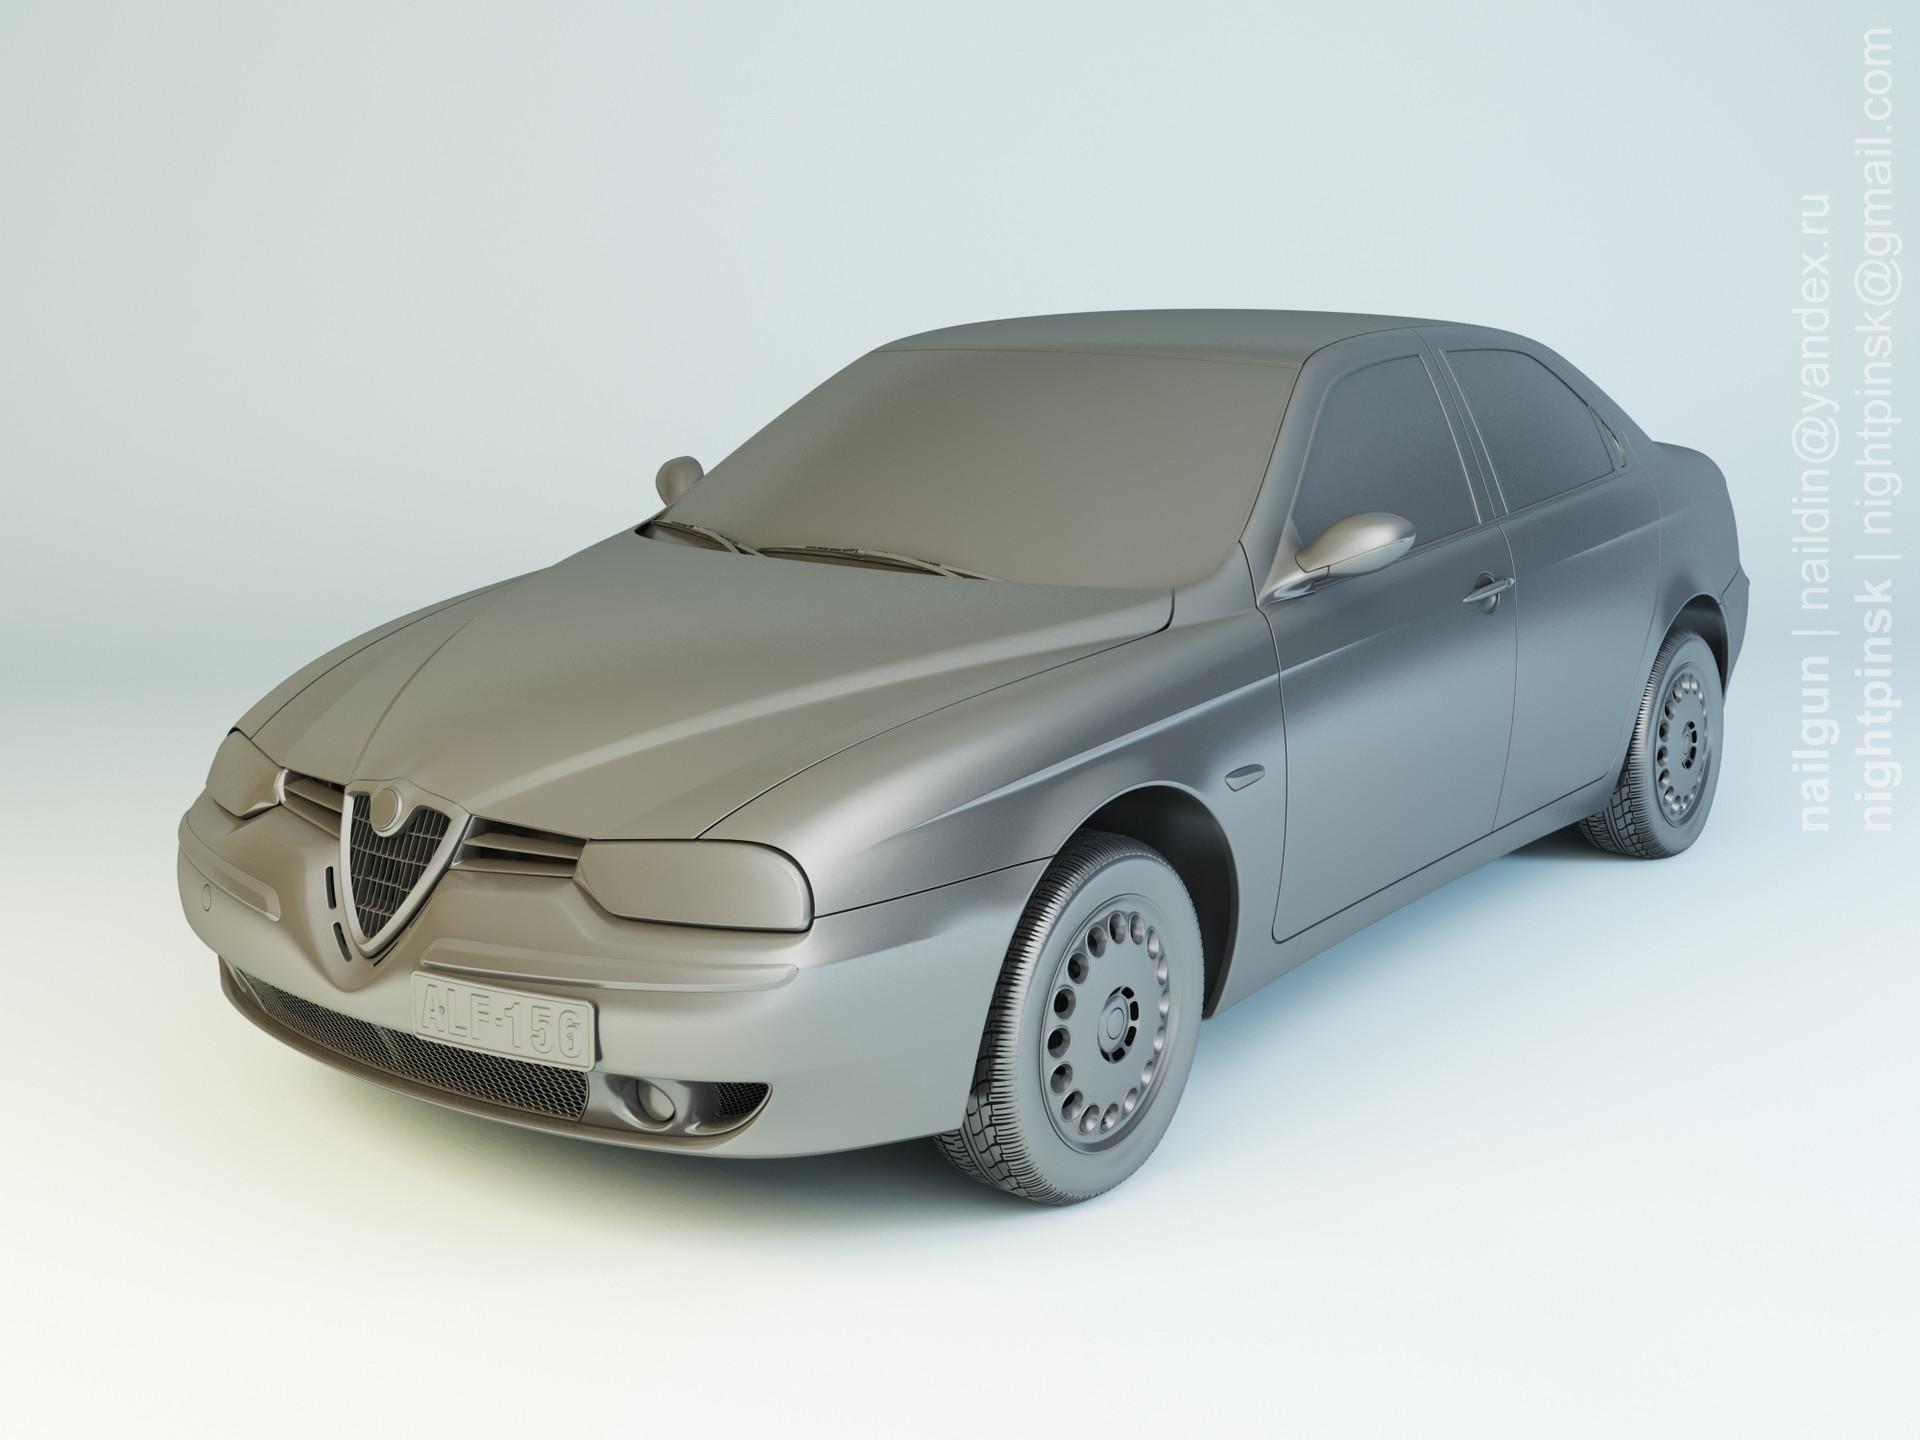 Nail khusnutdinov pwc 049 000 alfa romeo 156 modelling 0